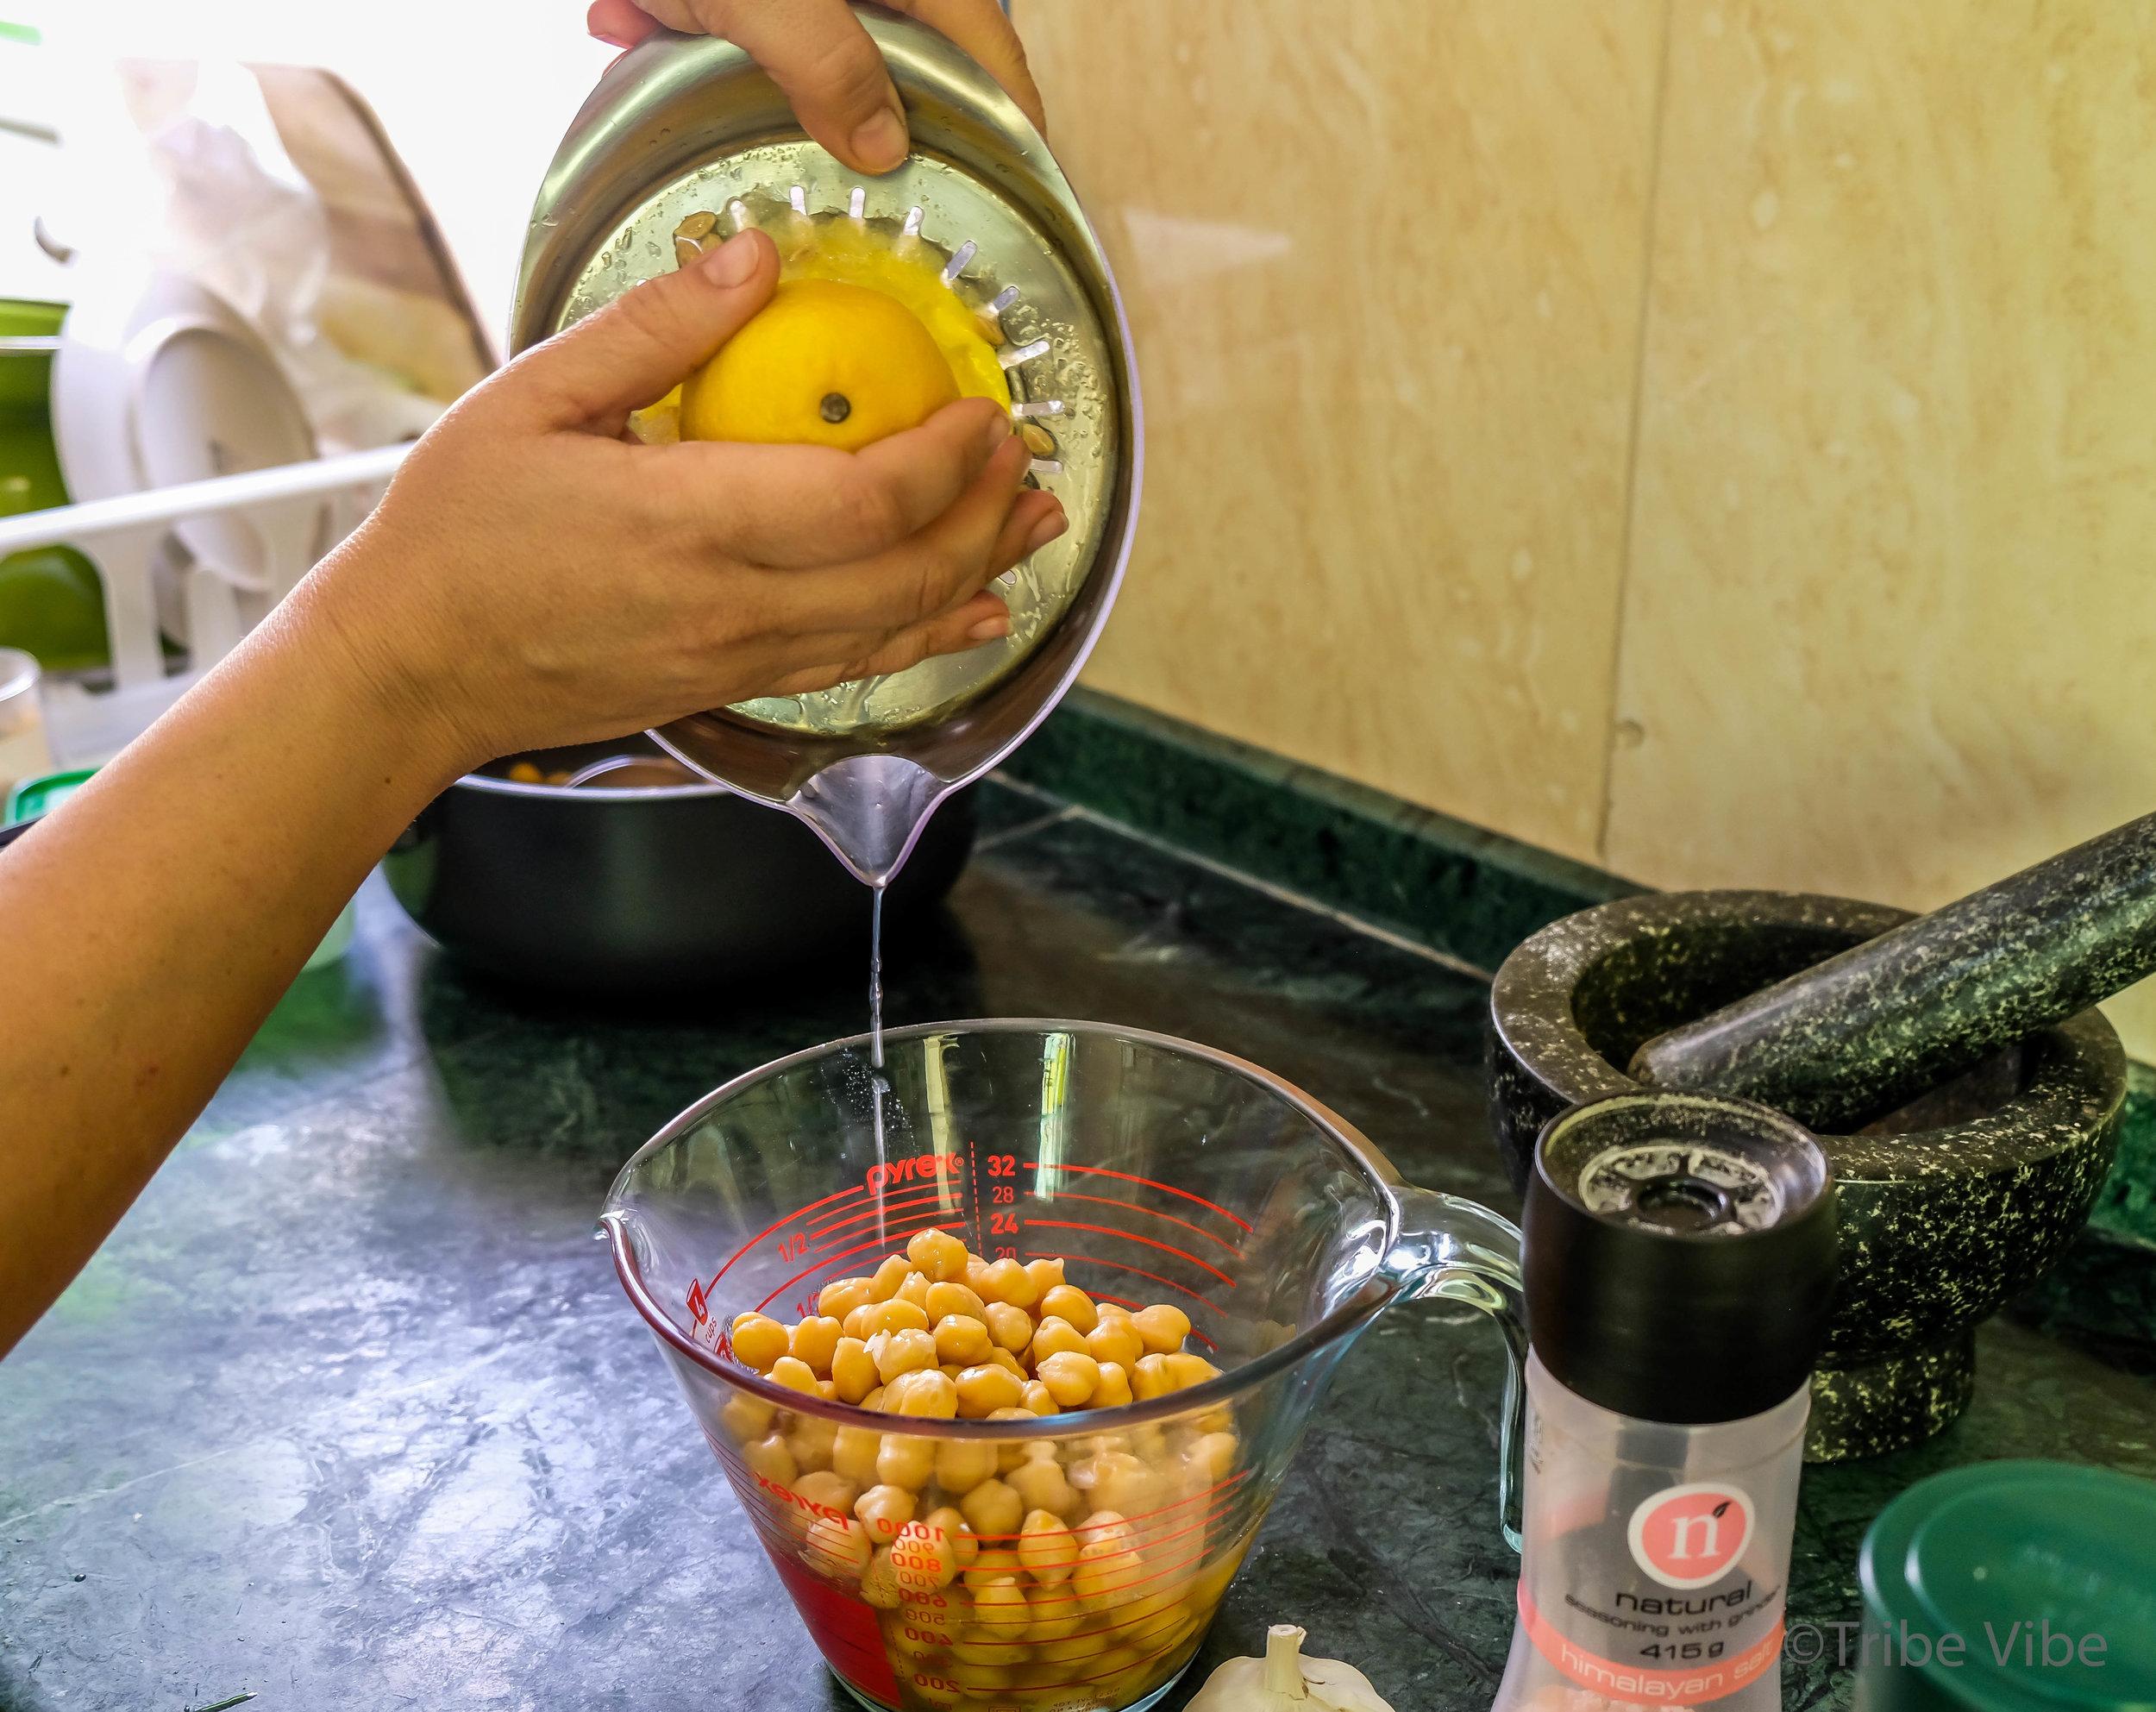 making hummus.jpg